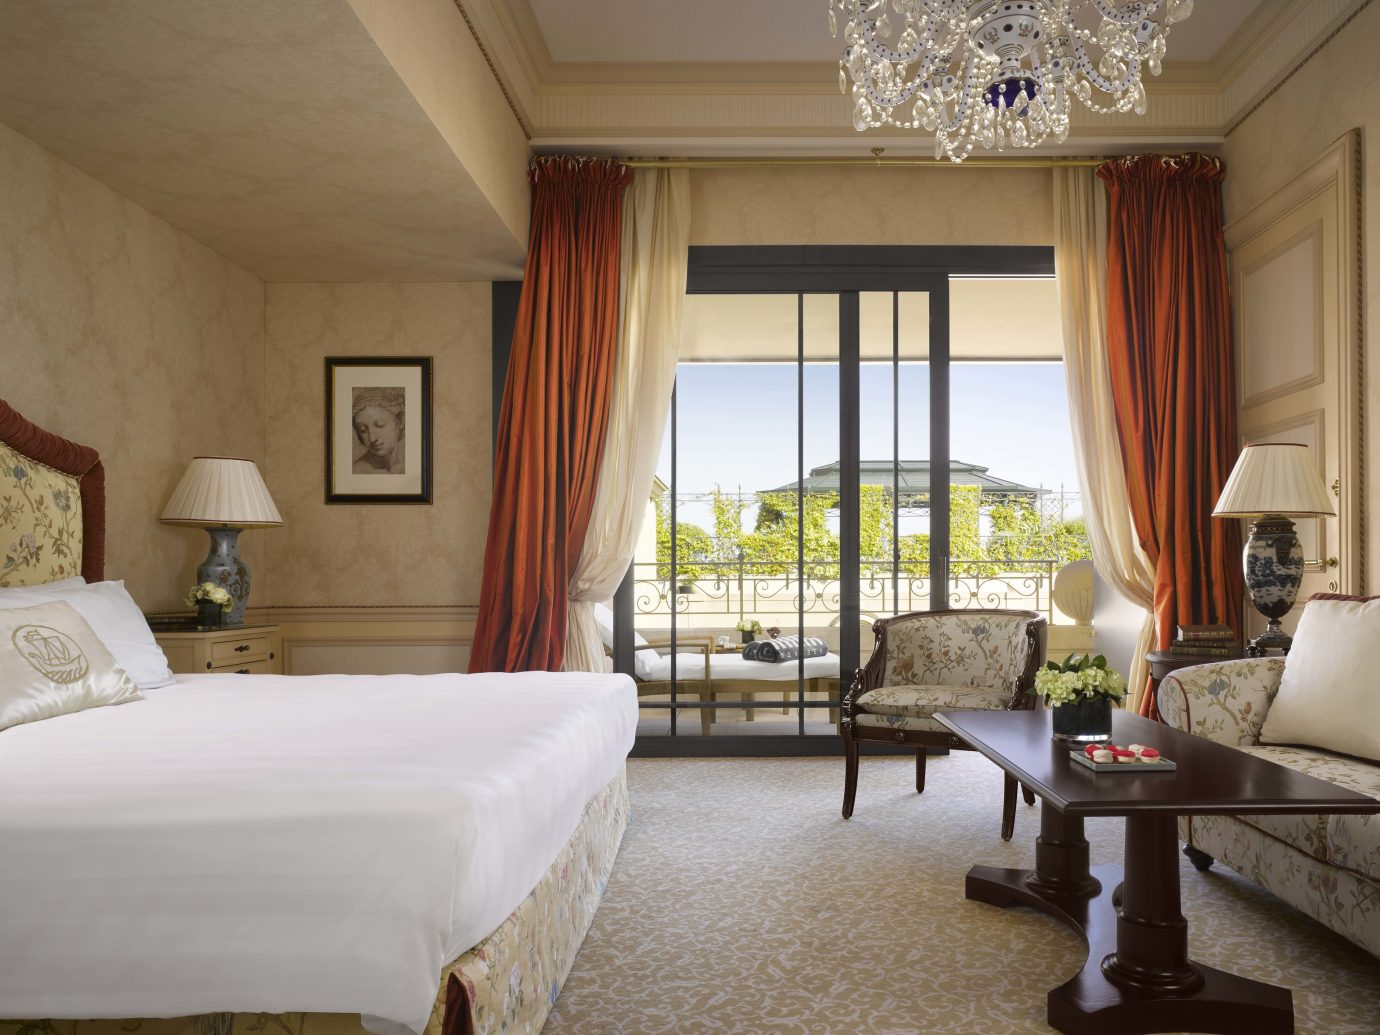 Bedroom at Hotel Metropole